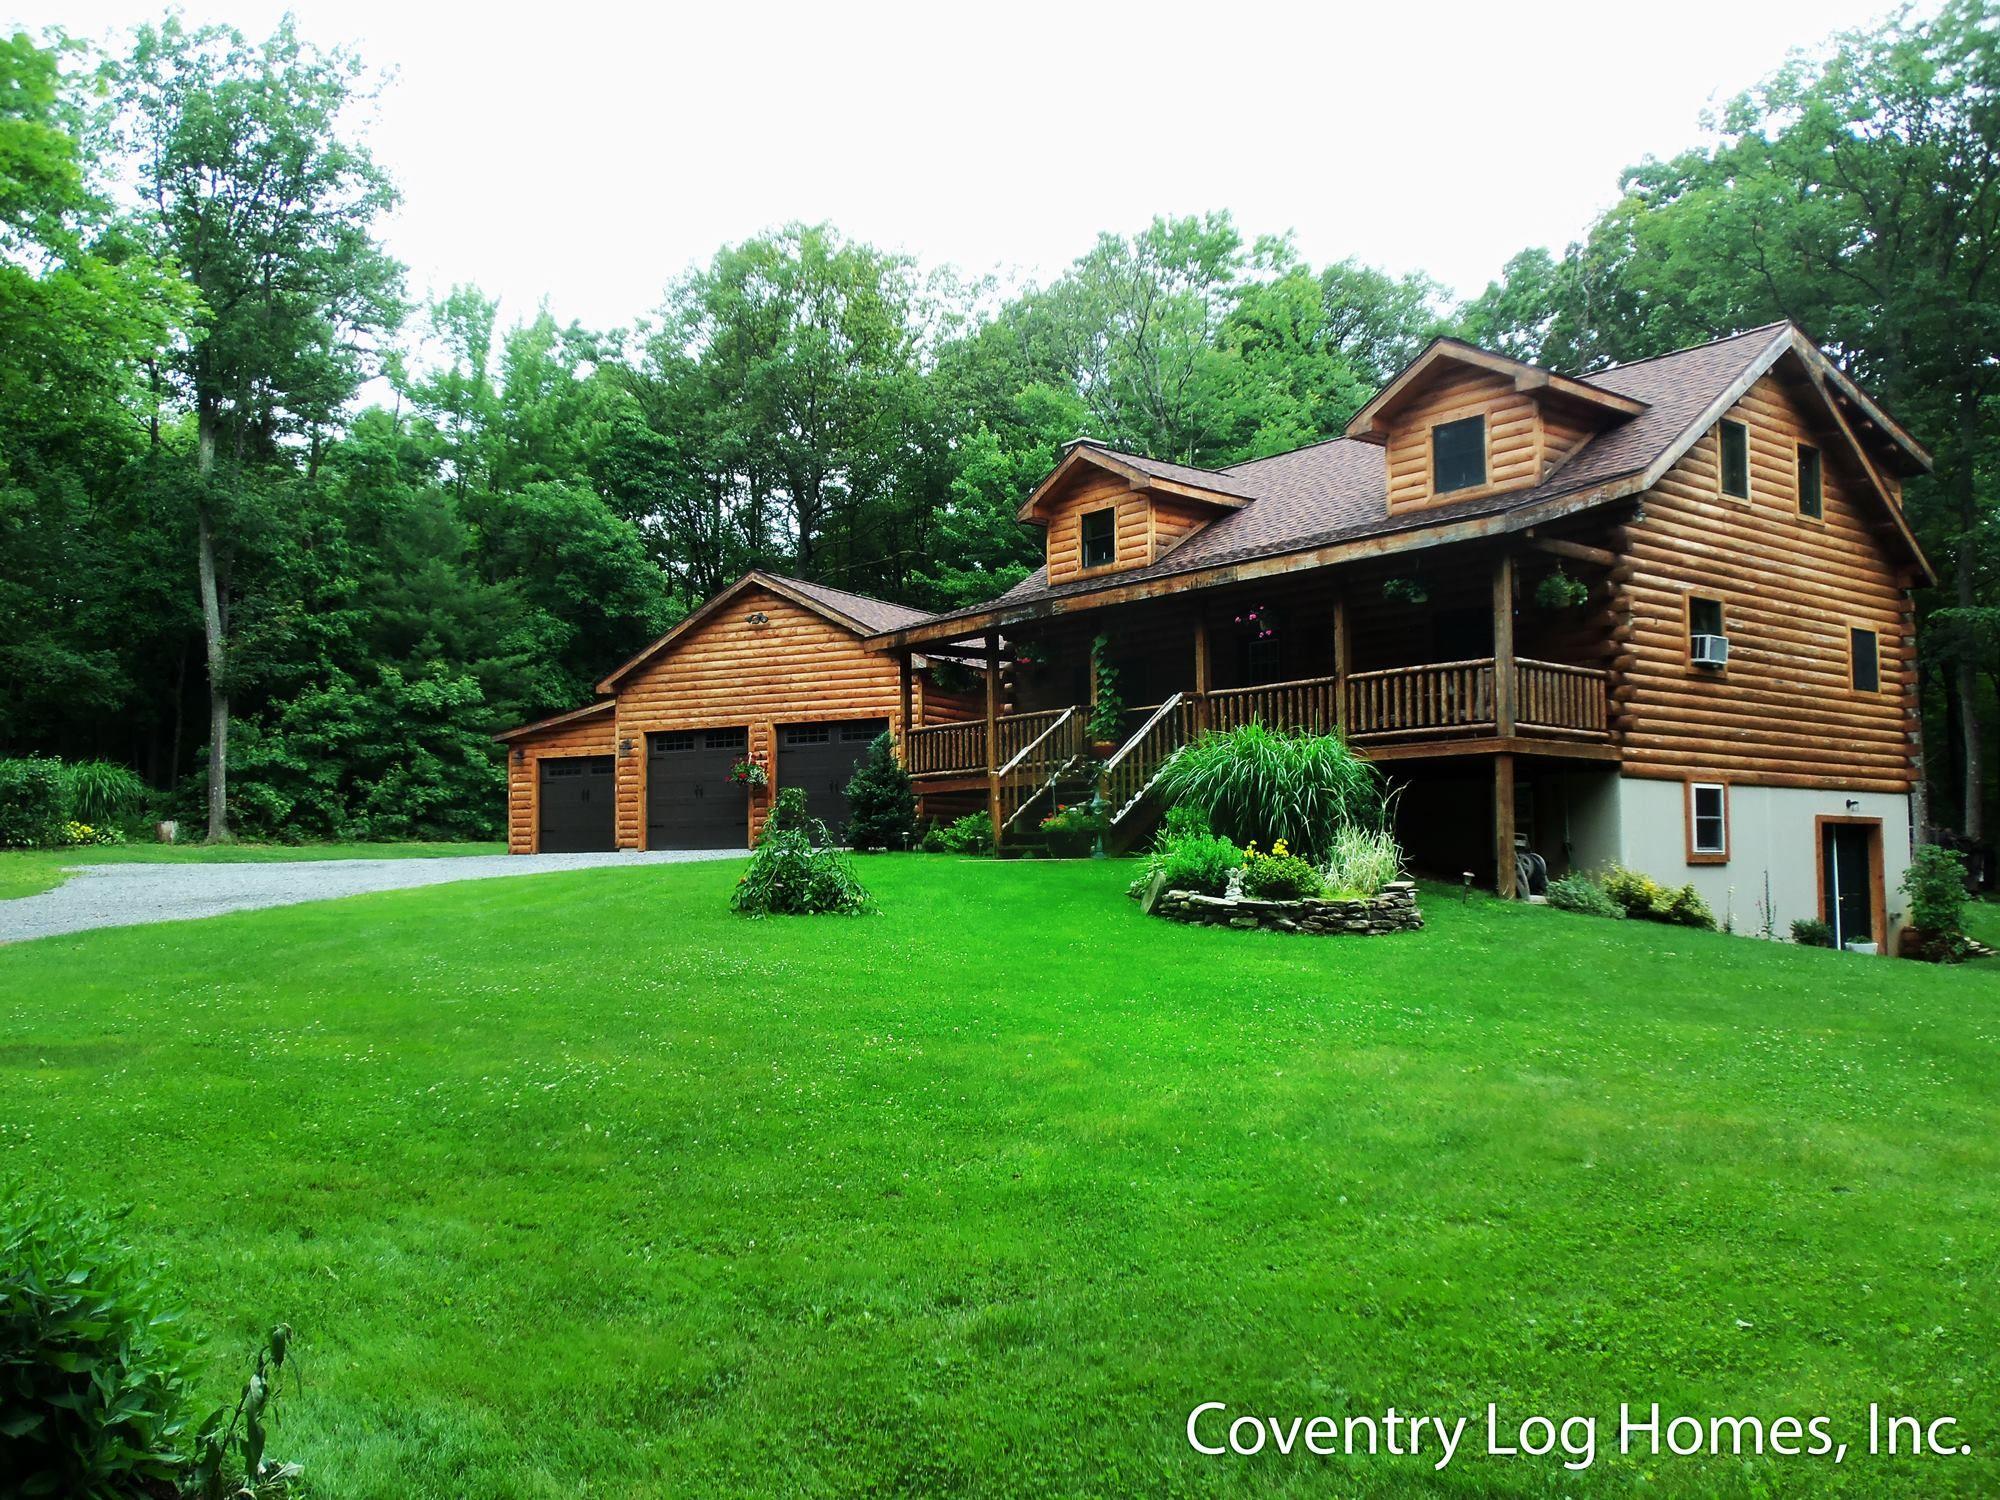 18 Surprisingly Log Home Garage  Home Plans  Blueprints